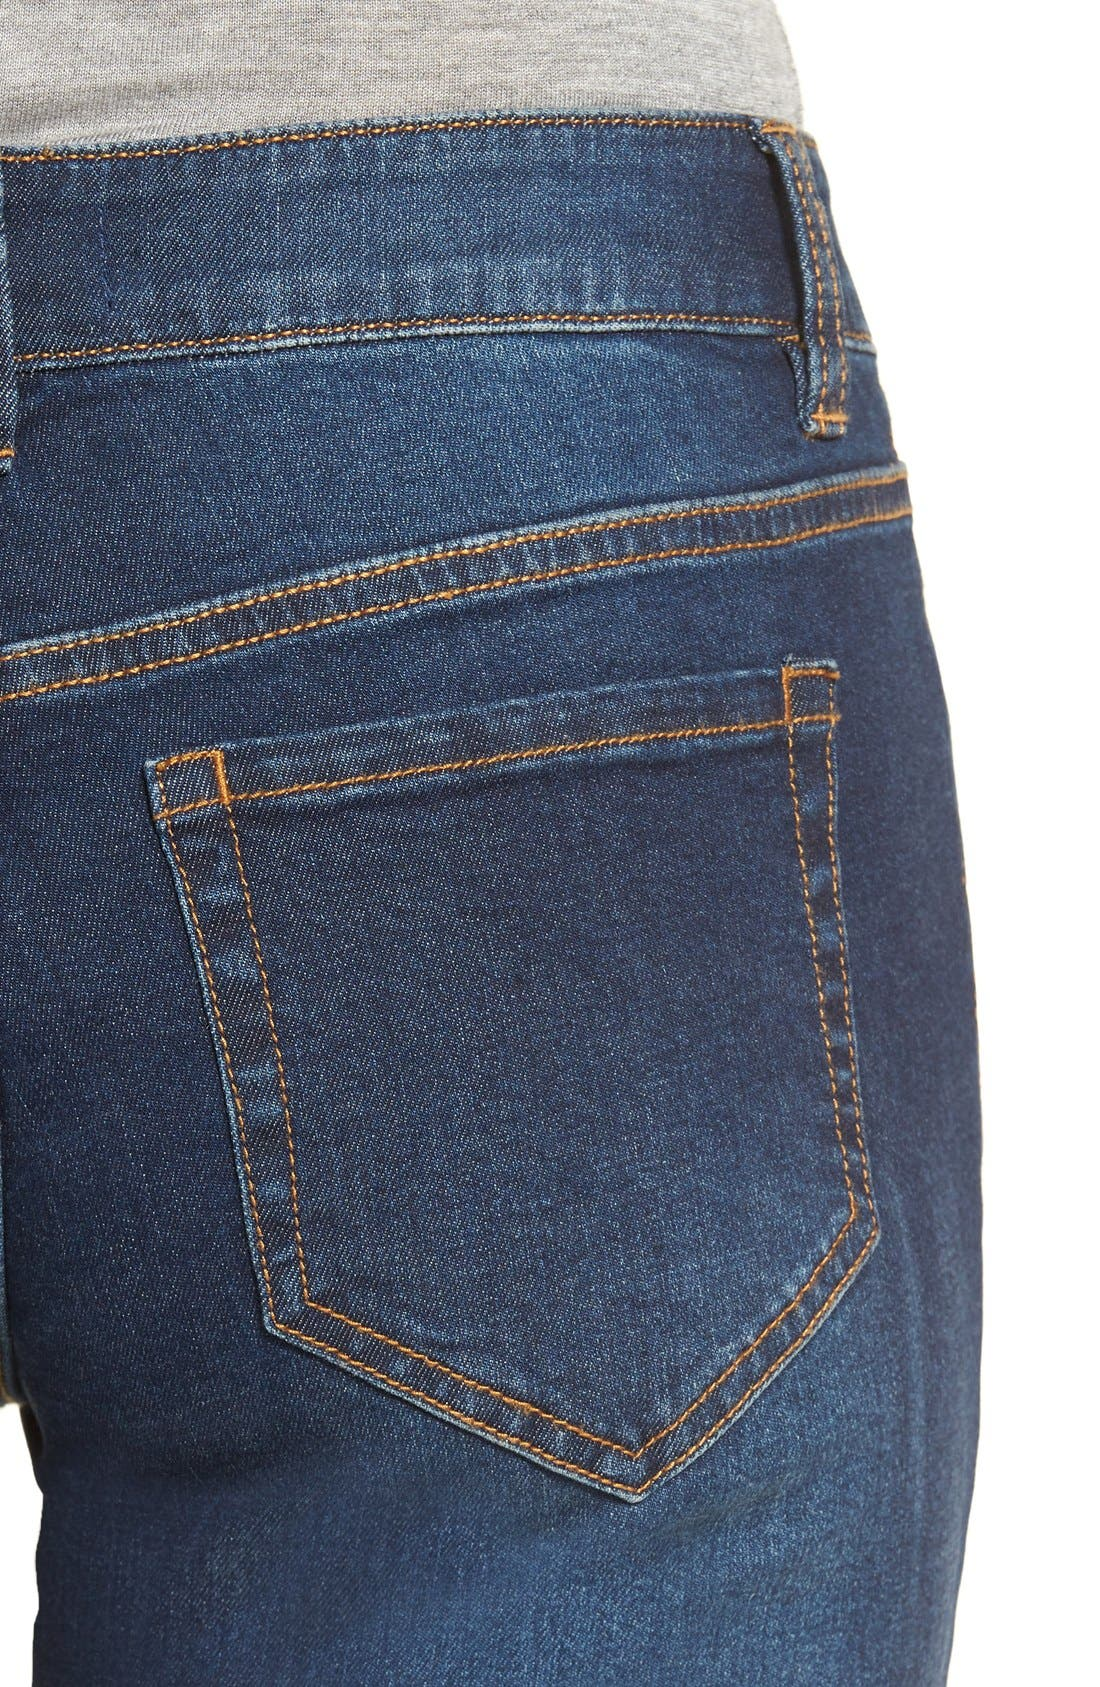 Alternate Image 5  - BP. Mid Rise Skinny Jeans